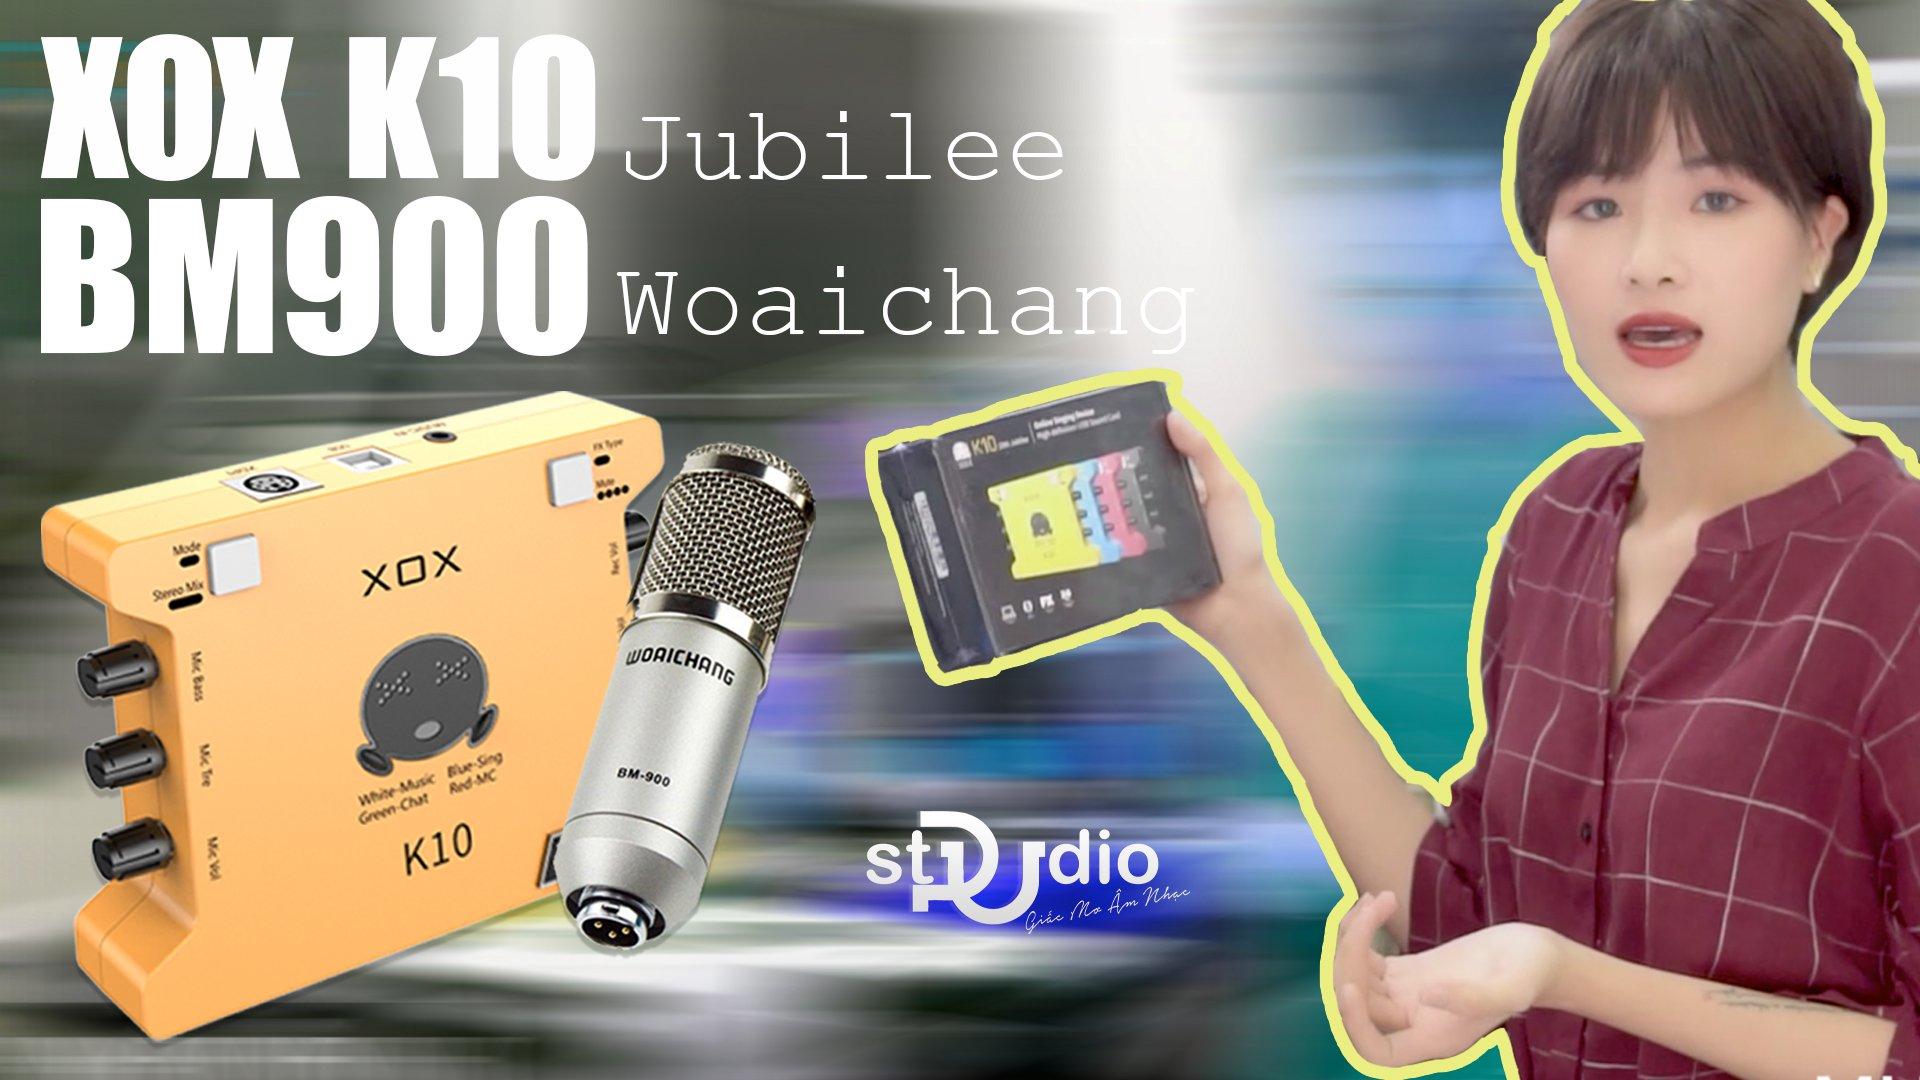 Test Mic livestream XOX K10 Jubilee Micro thu âm Bm900 Woaichang